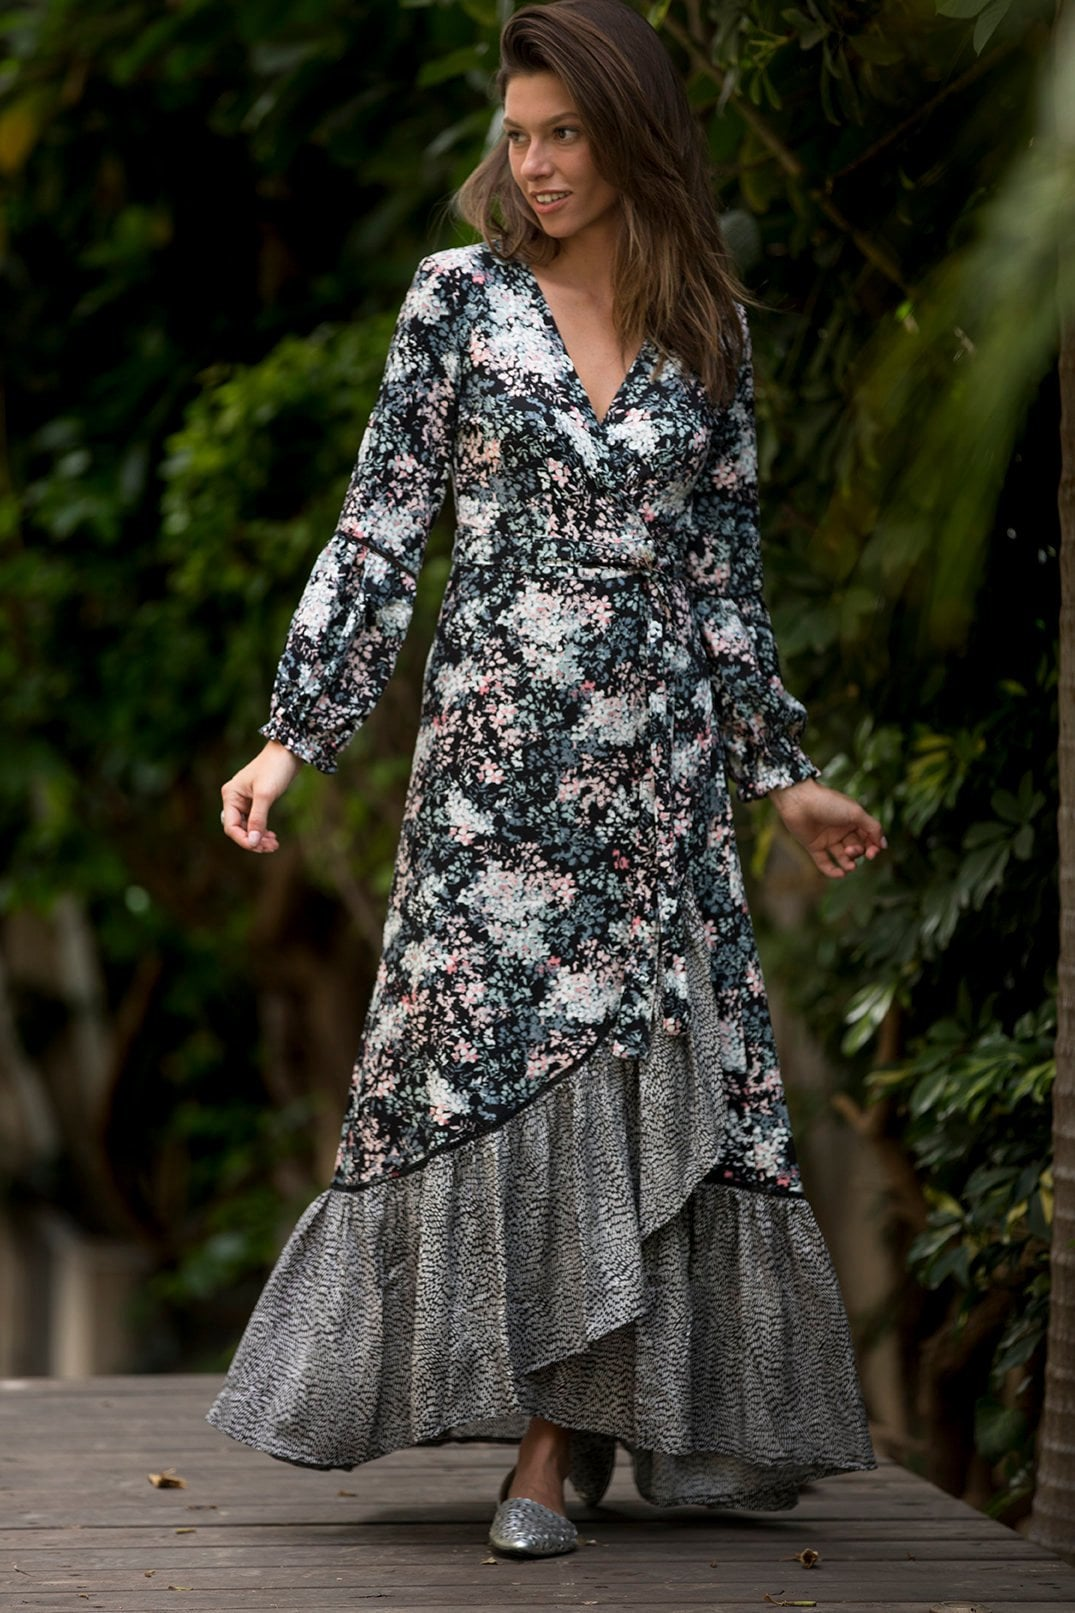 Black Floral Wrap Maxi Dress Bohemian Long Sleeves Dress Etsy